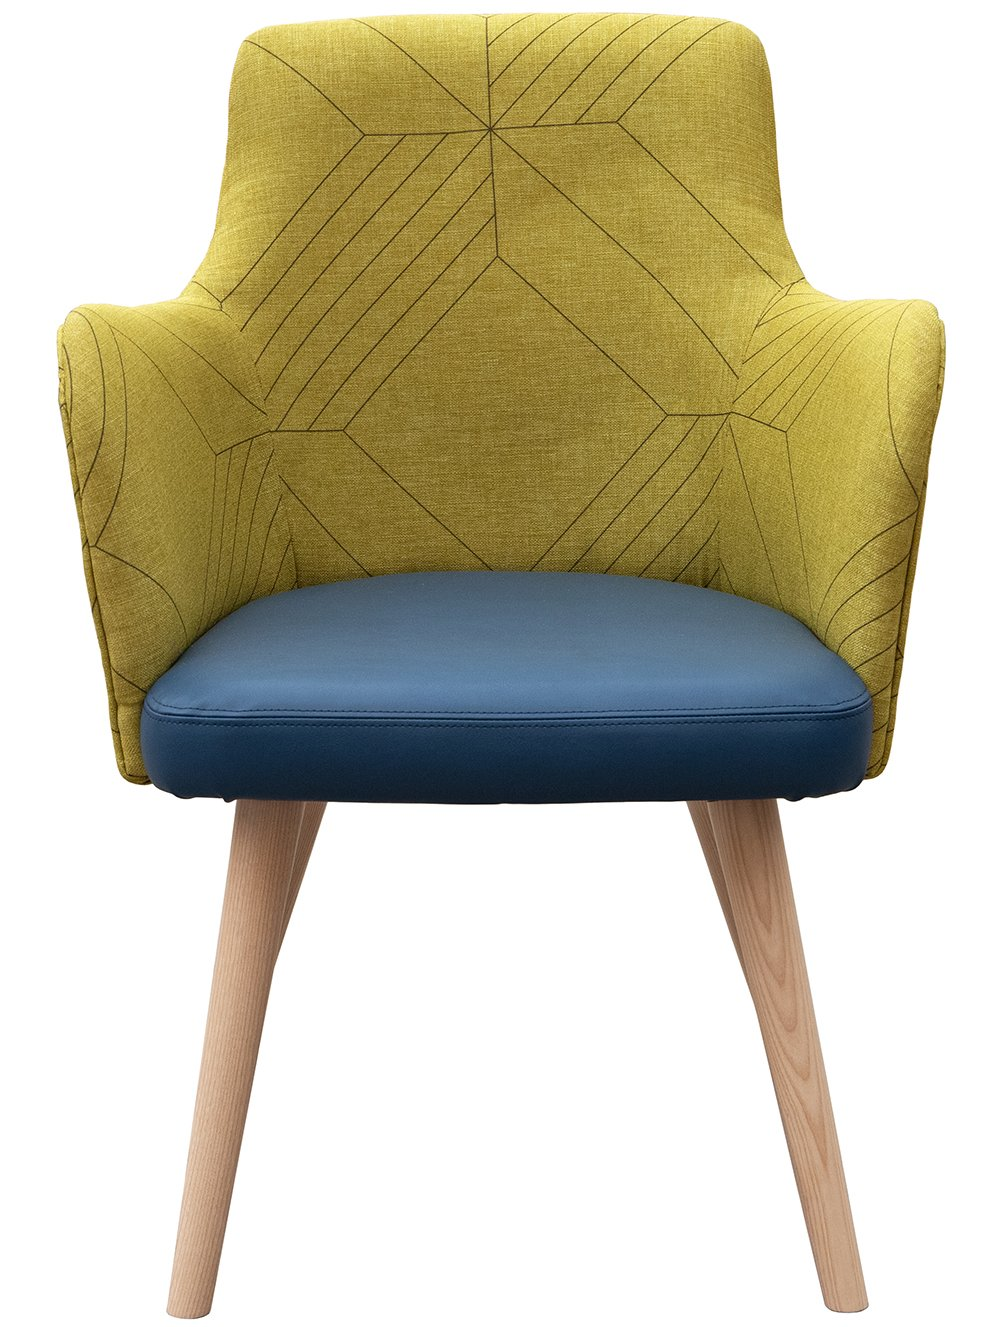 Camden arm chair